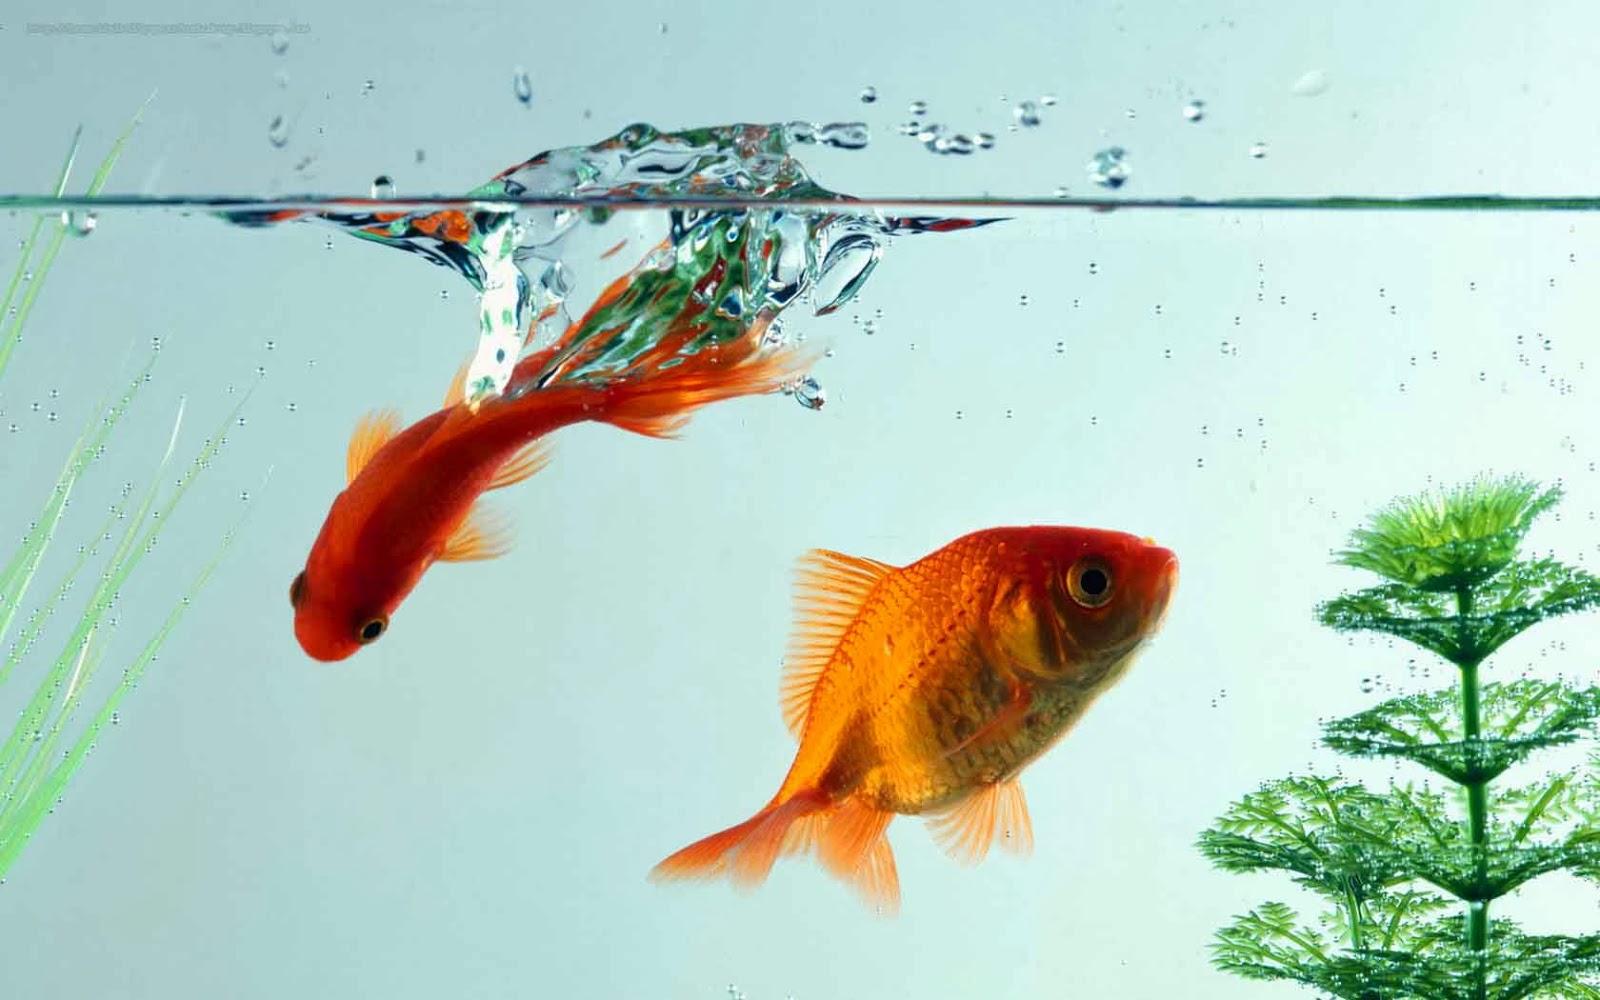 http://beautifulwallpapersfordesktop.blogspot.com/2014/01/beautiful-small-fishes-wallpapers.html